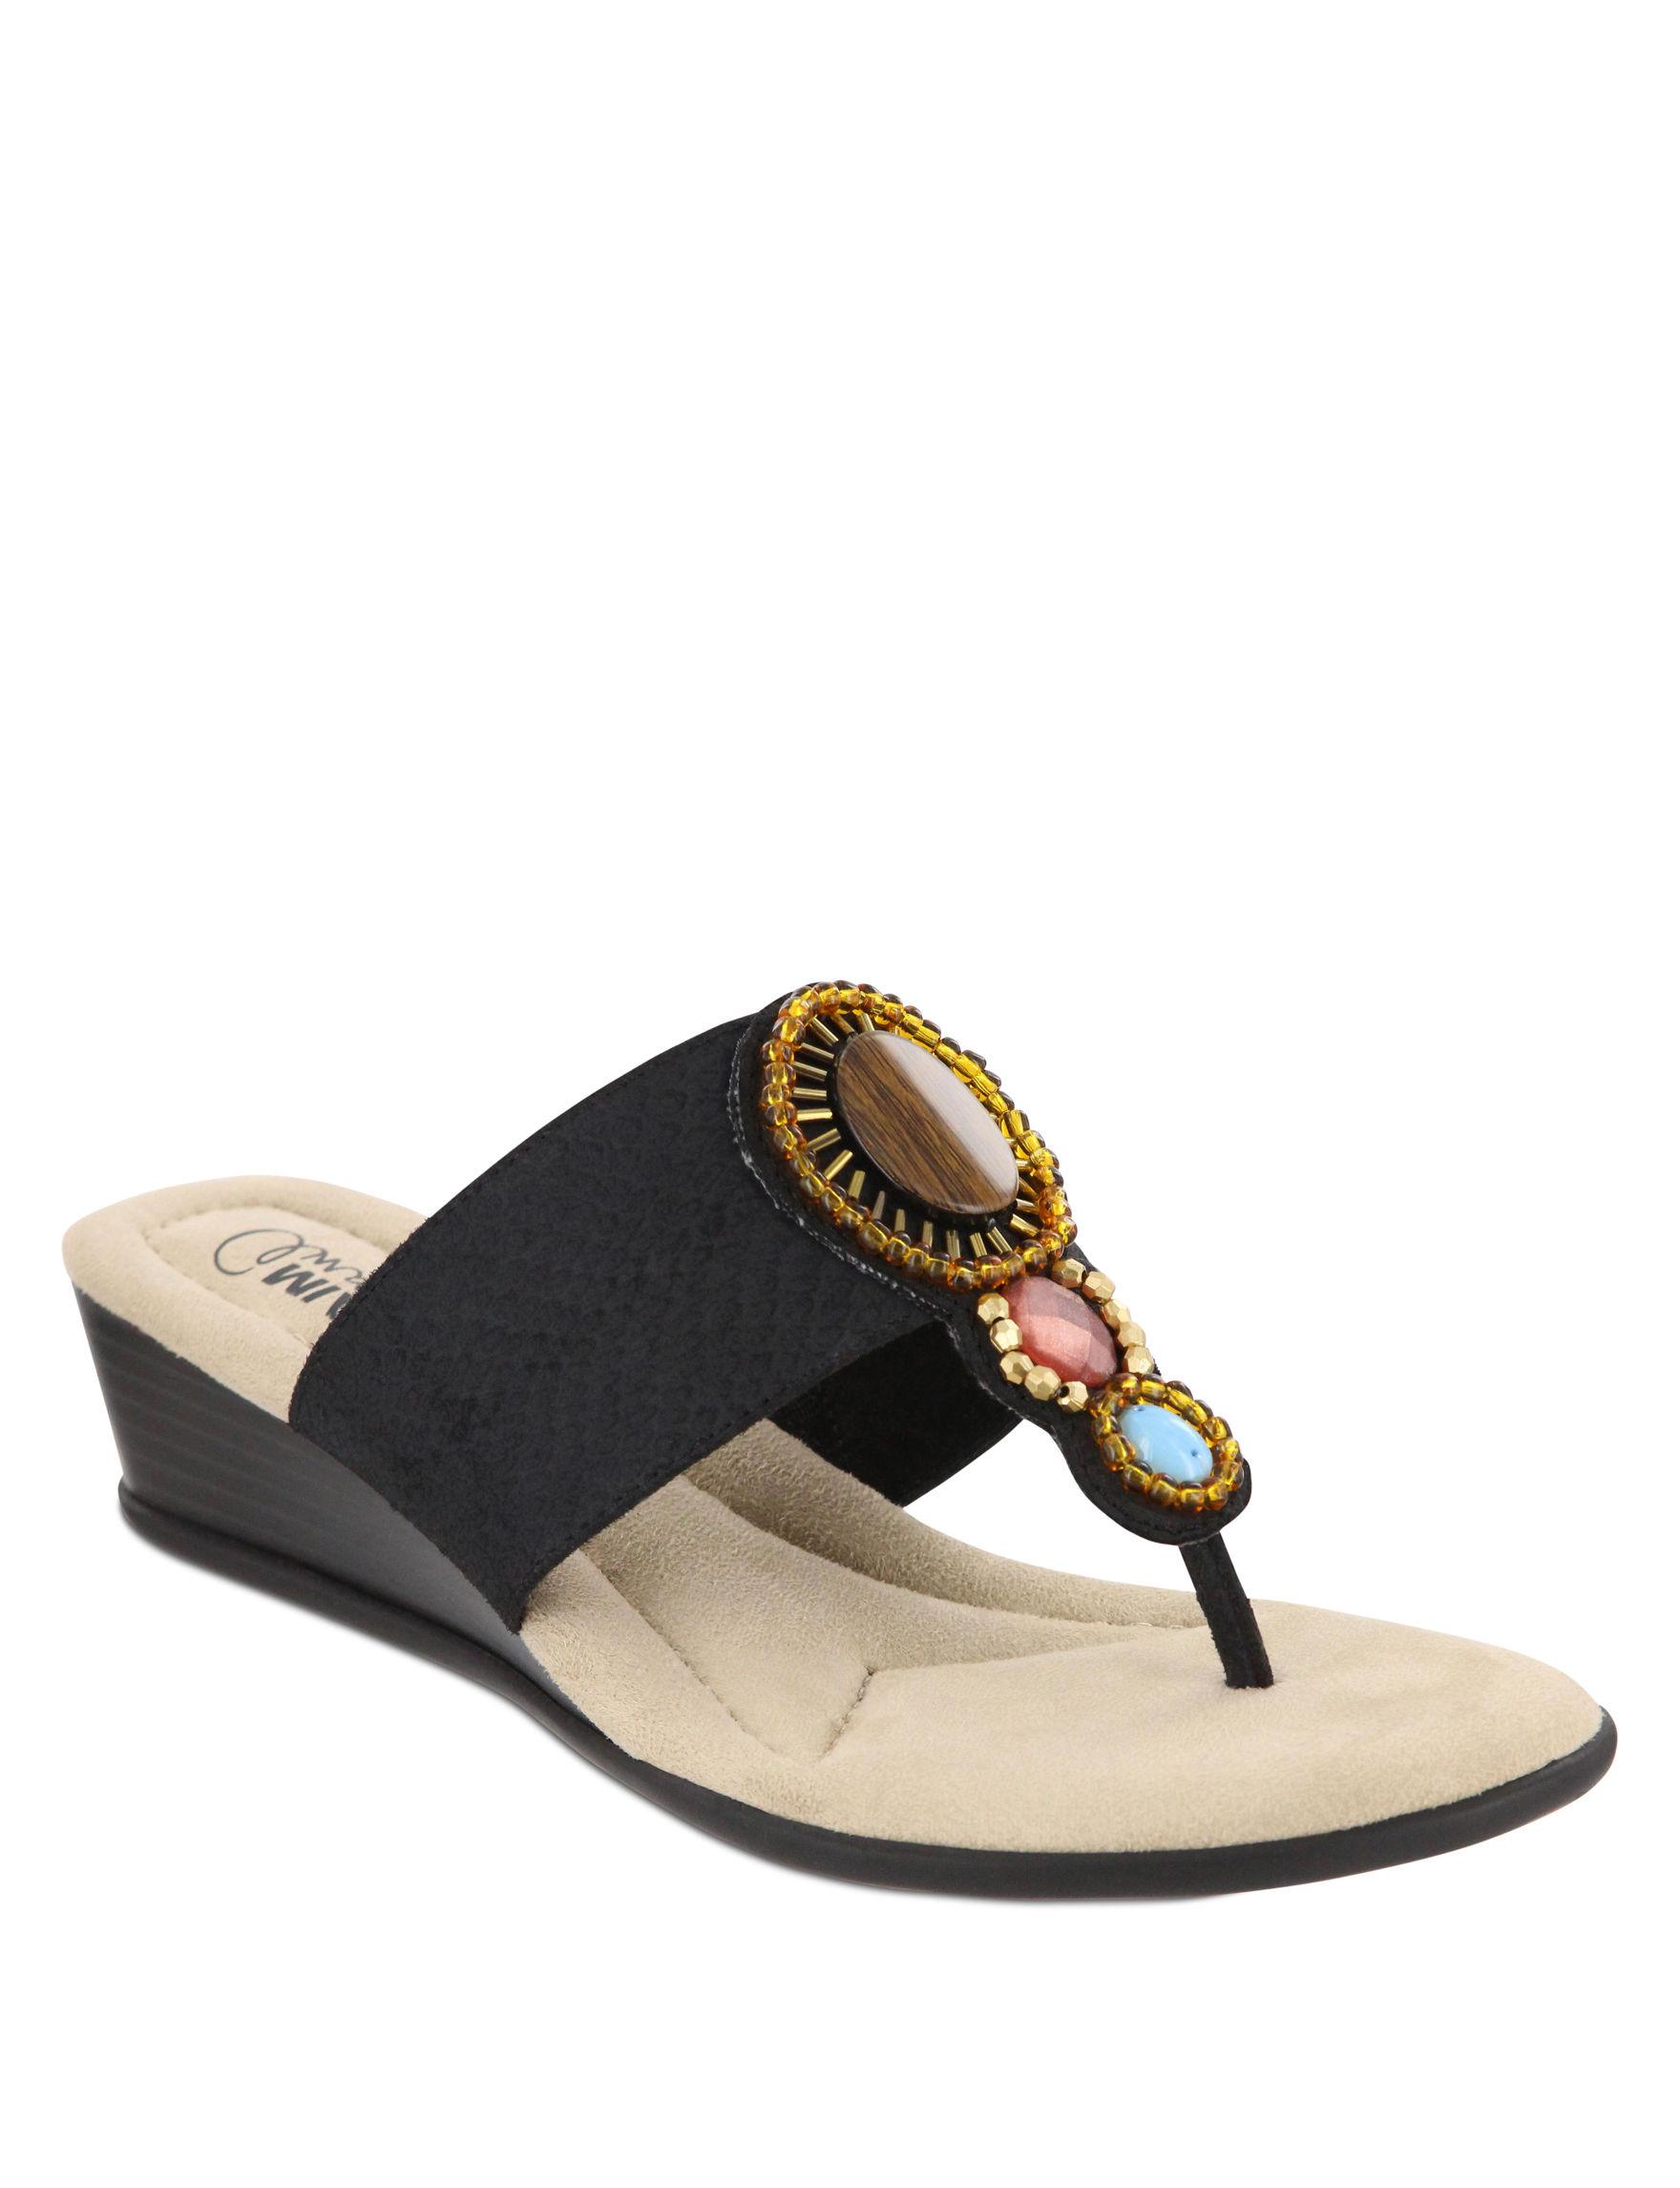 MIA Black Wedge Sandals